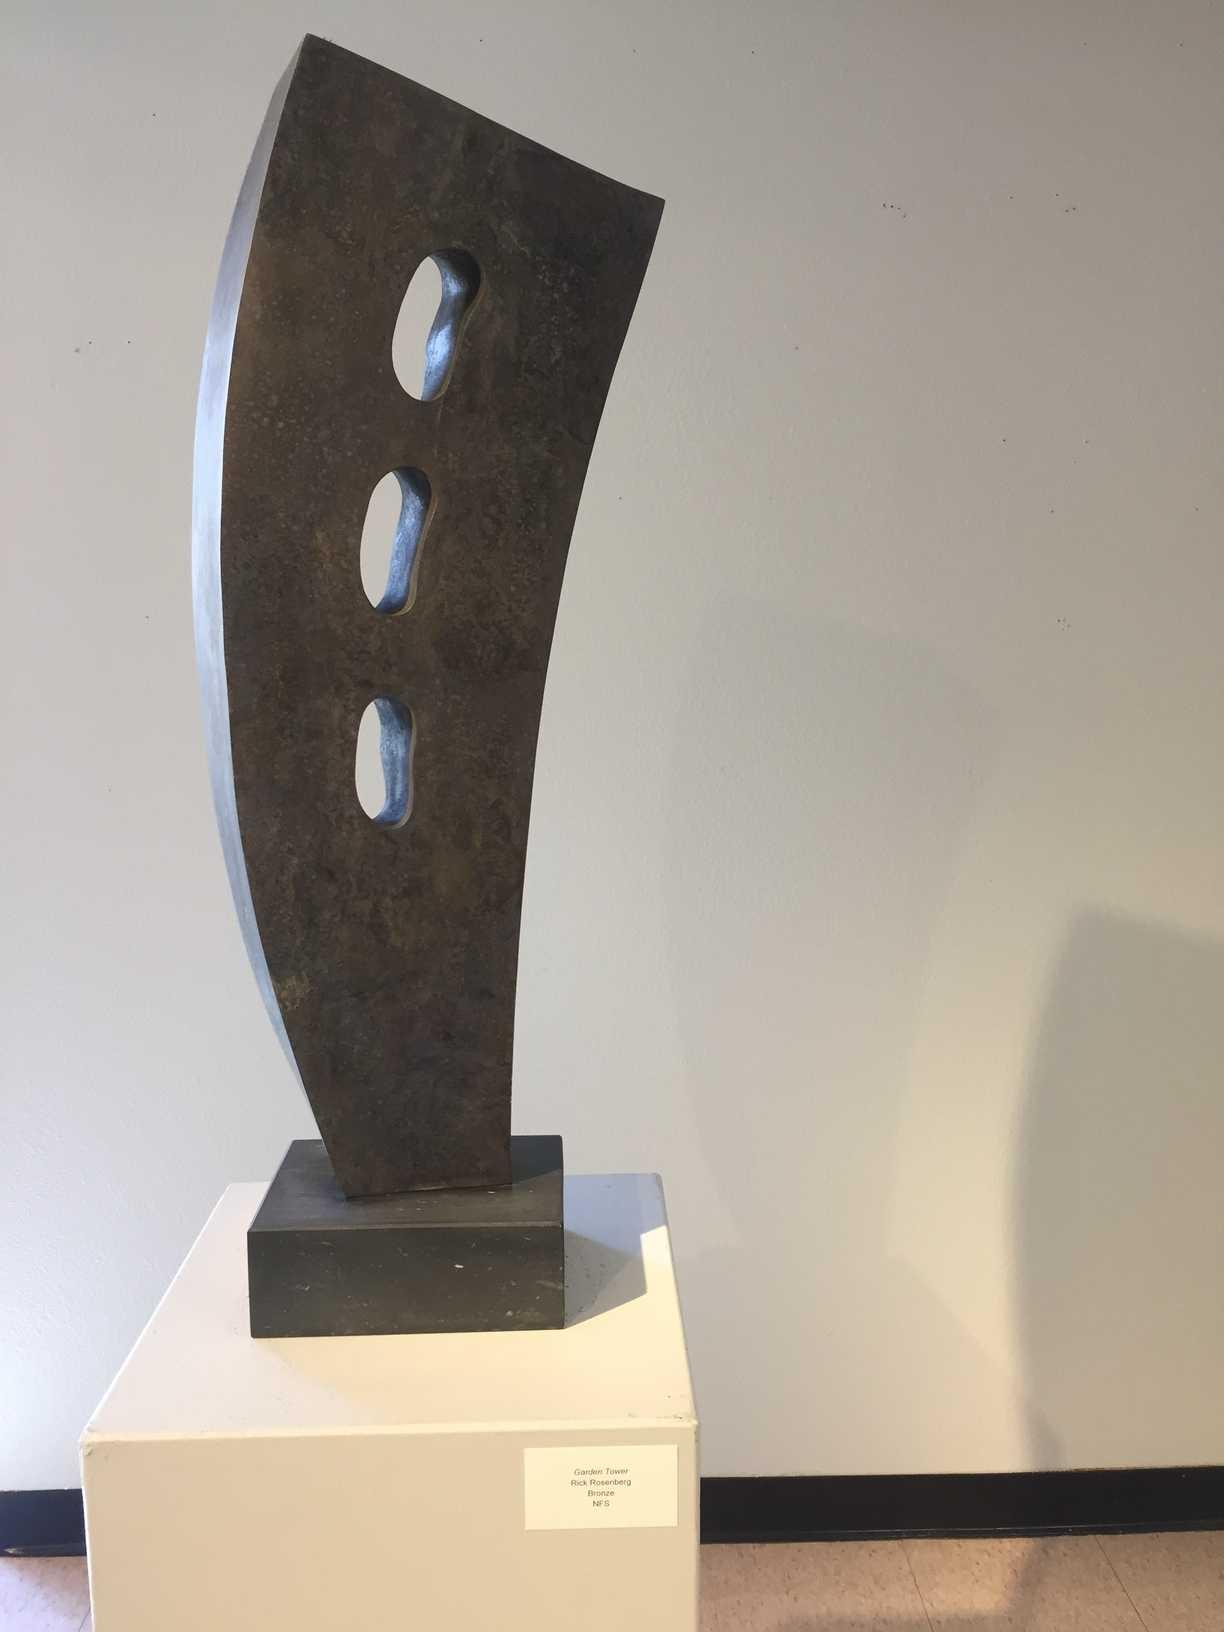 The bronze statue piece